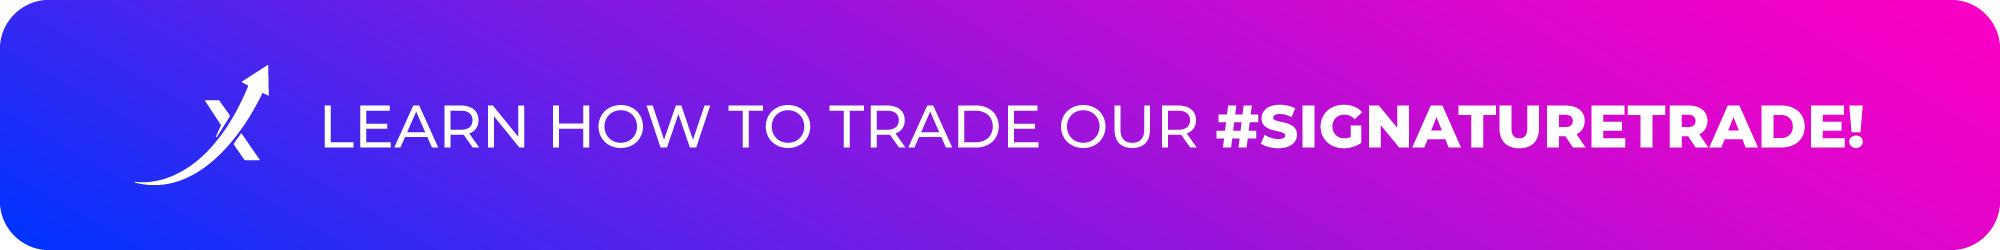 sig trade banner